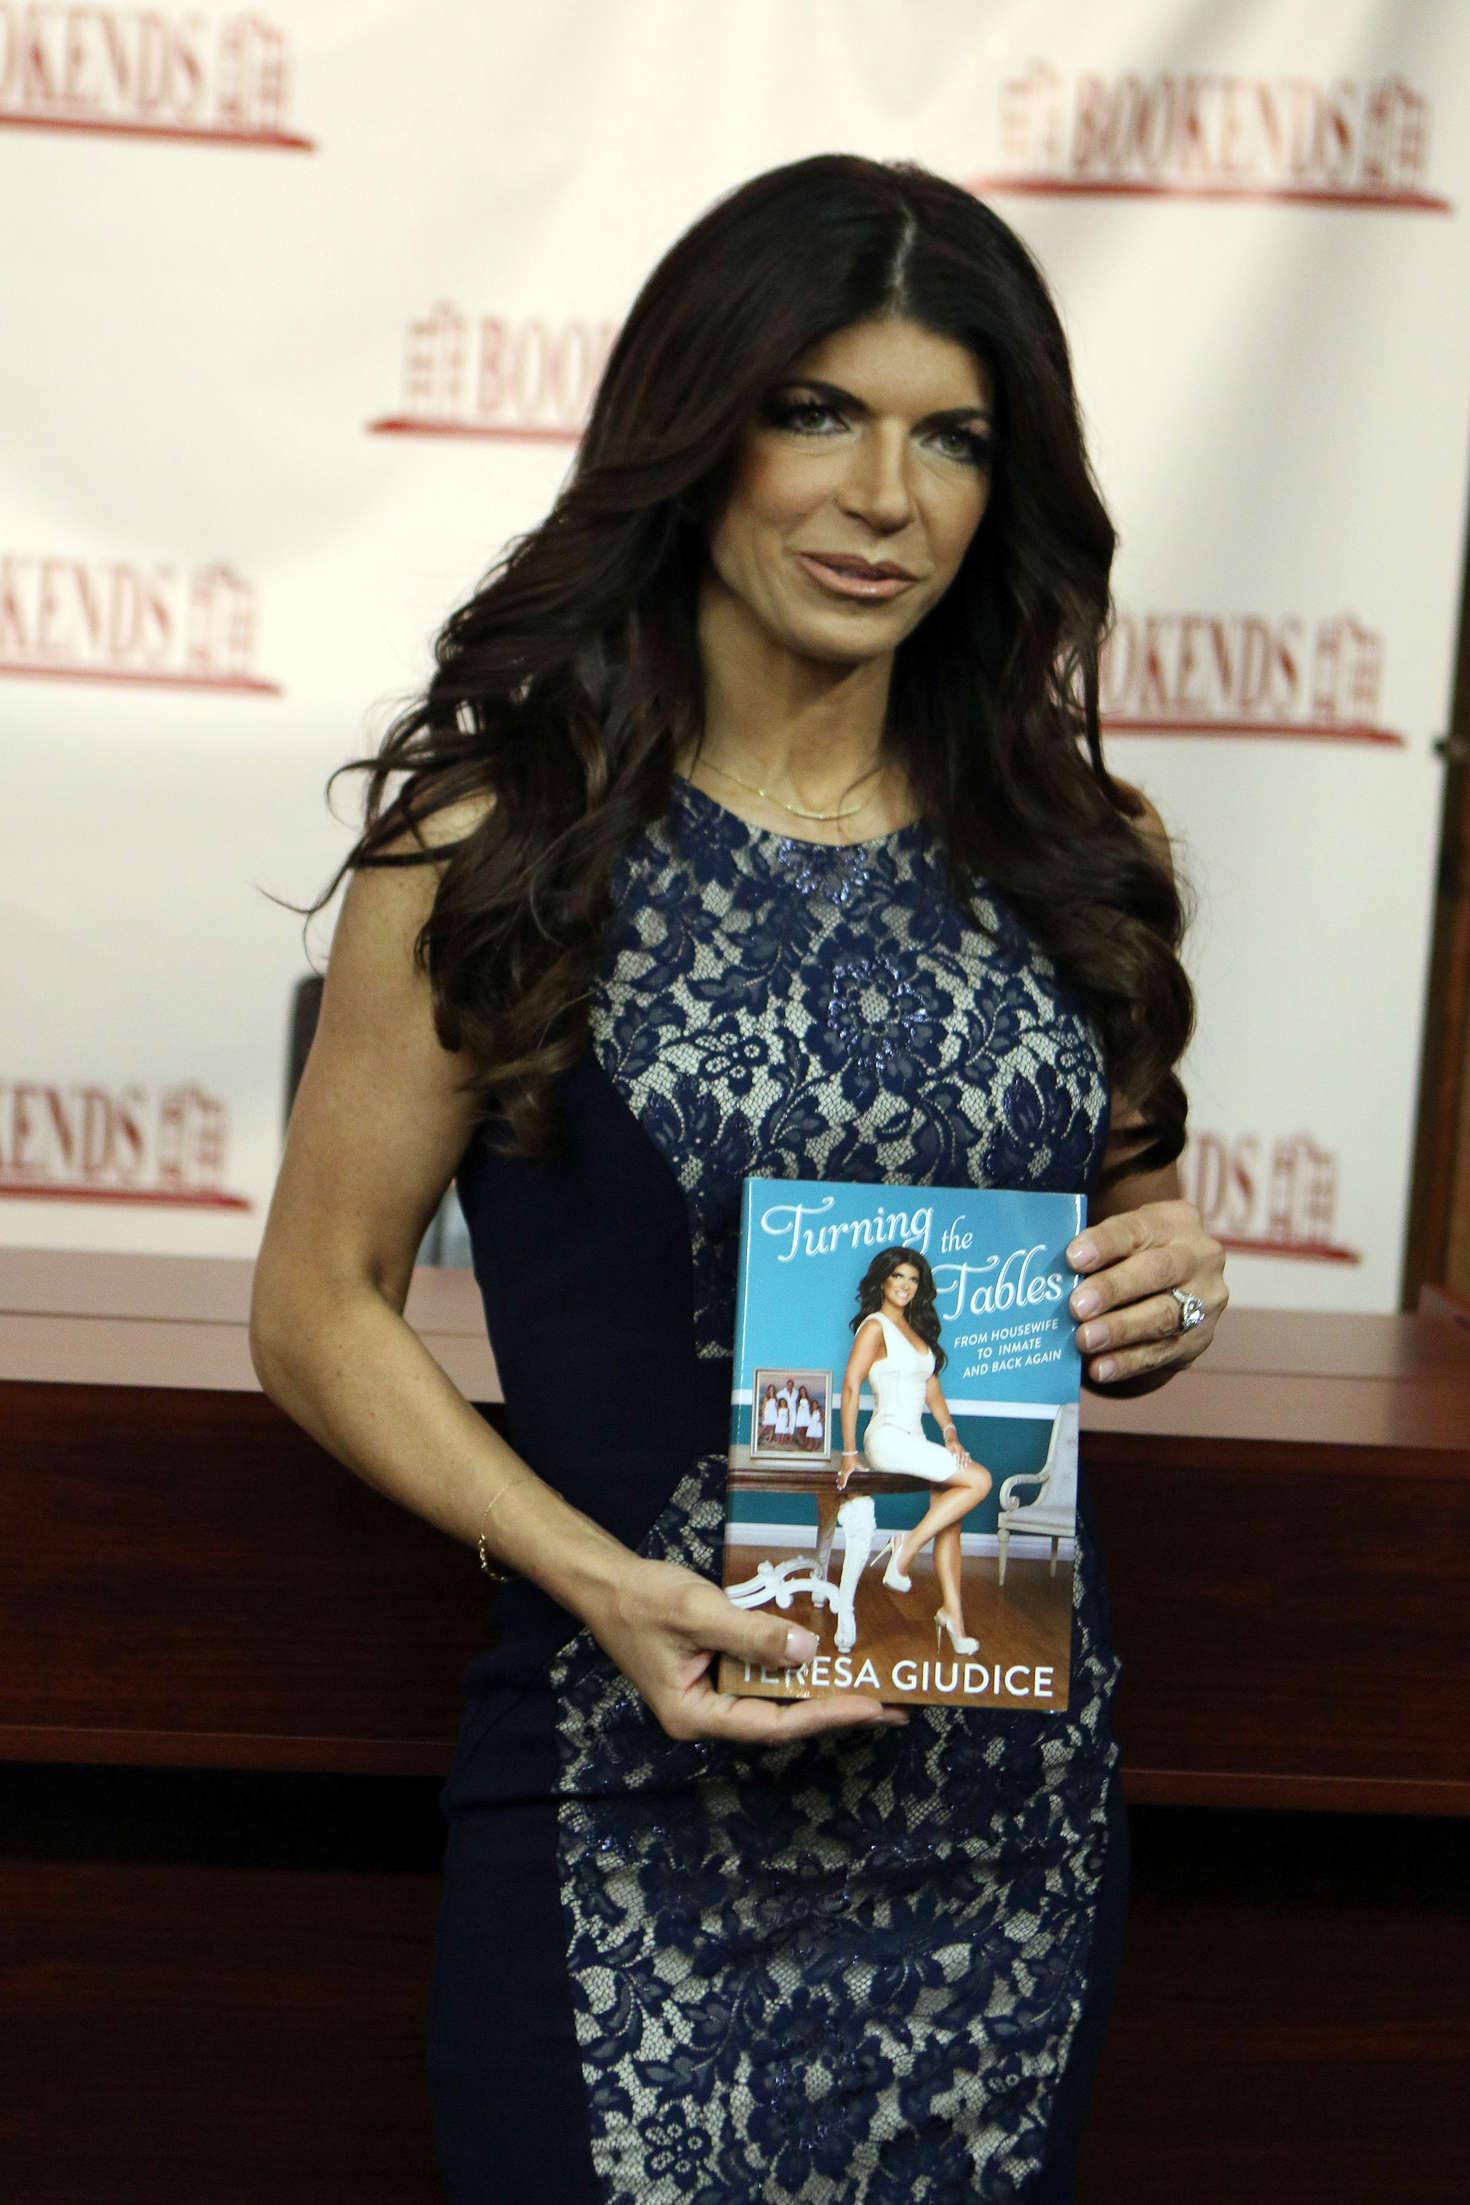 Teresa Giudice book signing in New Jersey